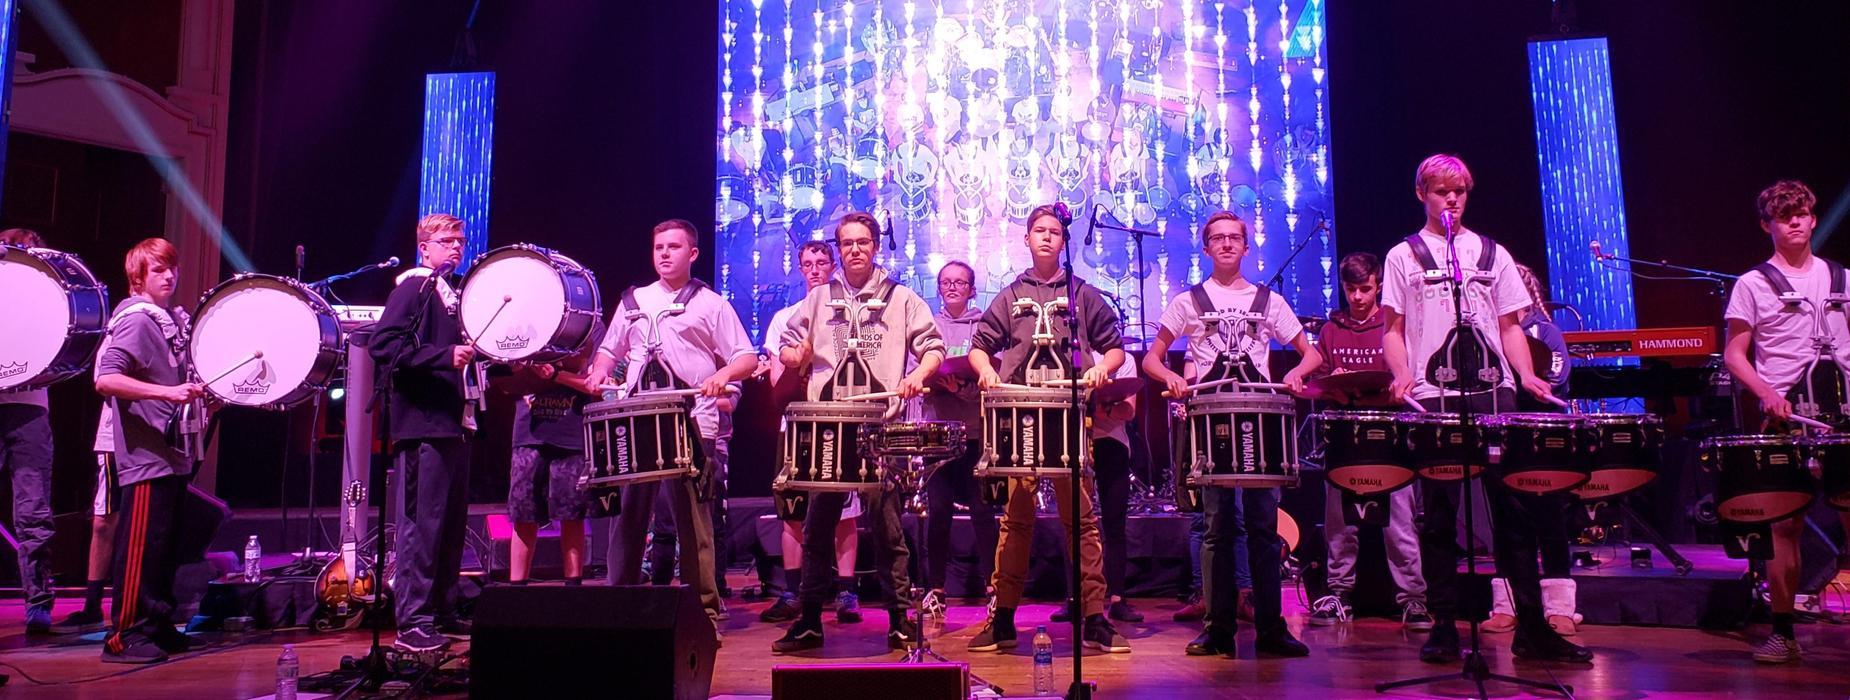 Norwin Drumline